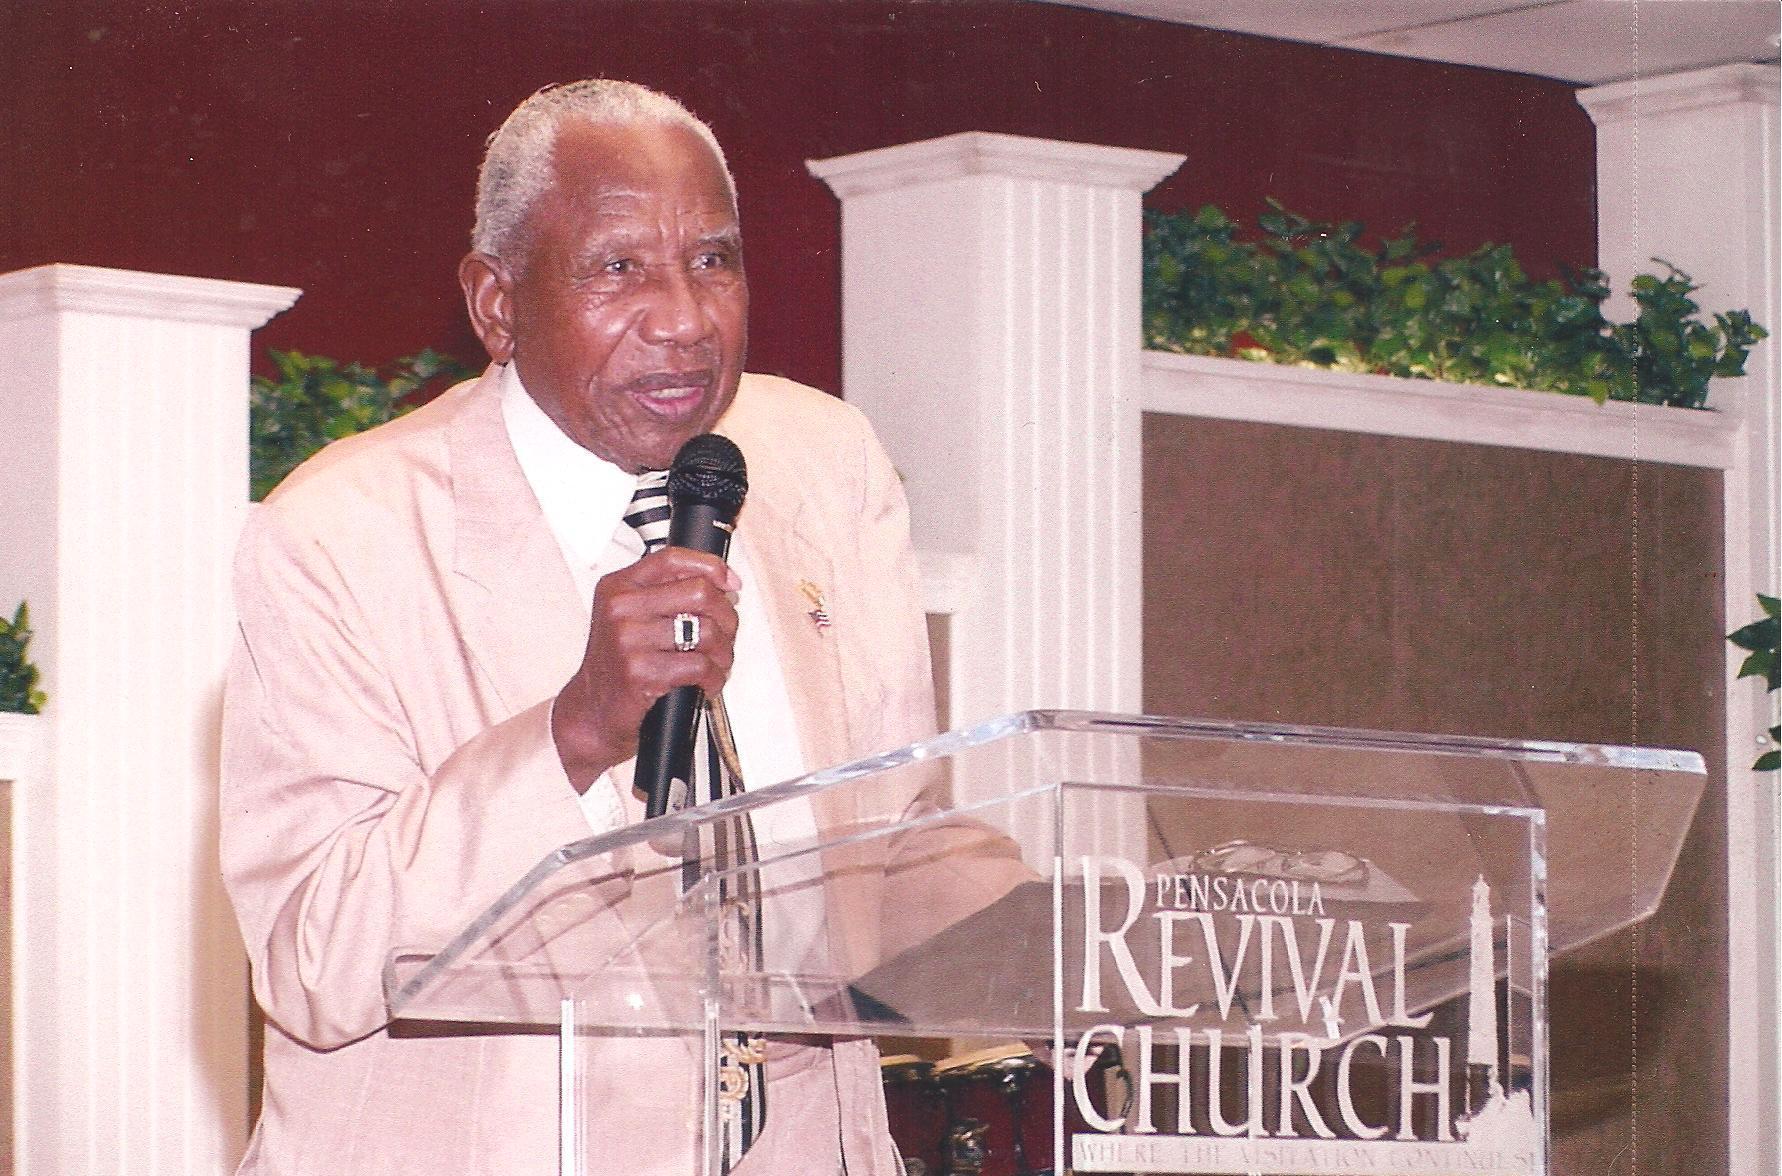 Bishop Clark preaching